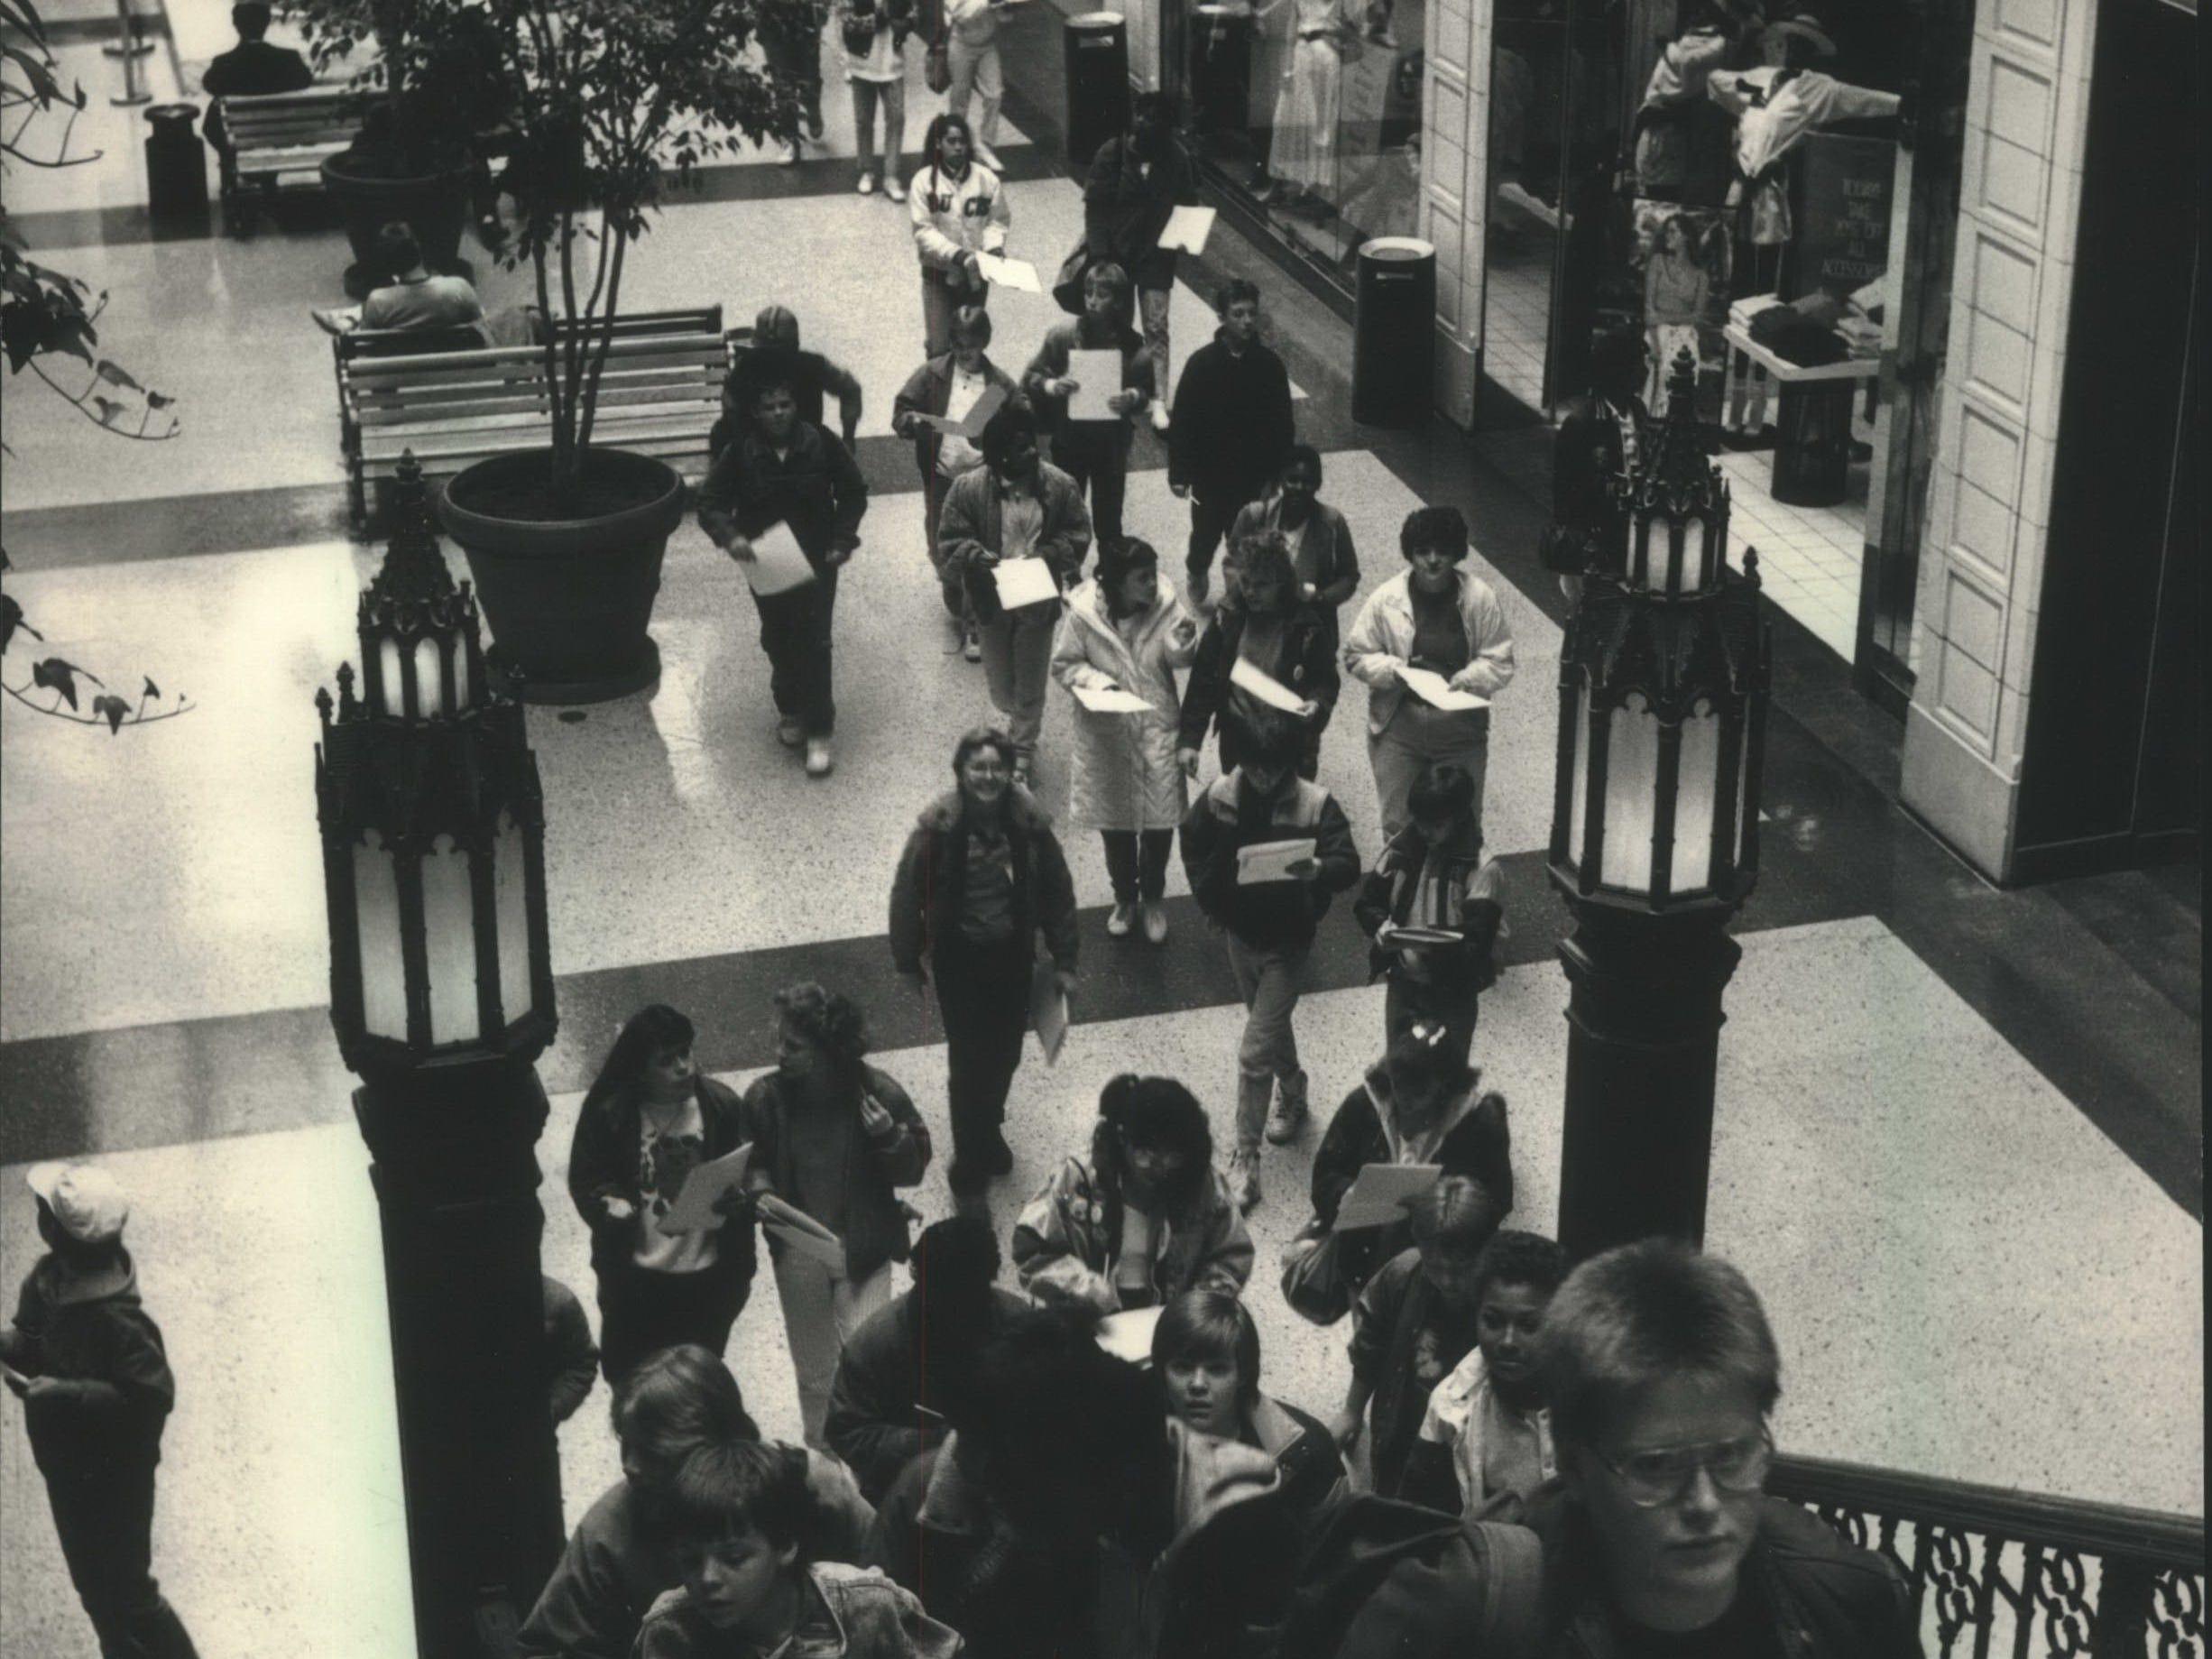 Milwaukee - Audubon Middle School students begin their Downtown tour in The Grand Avenue's Plankinton Arcade